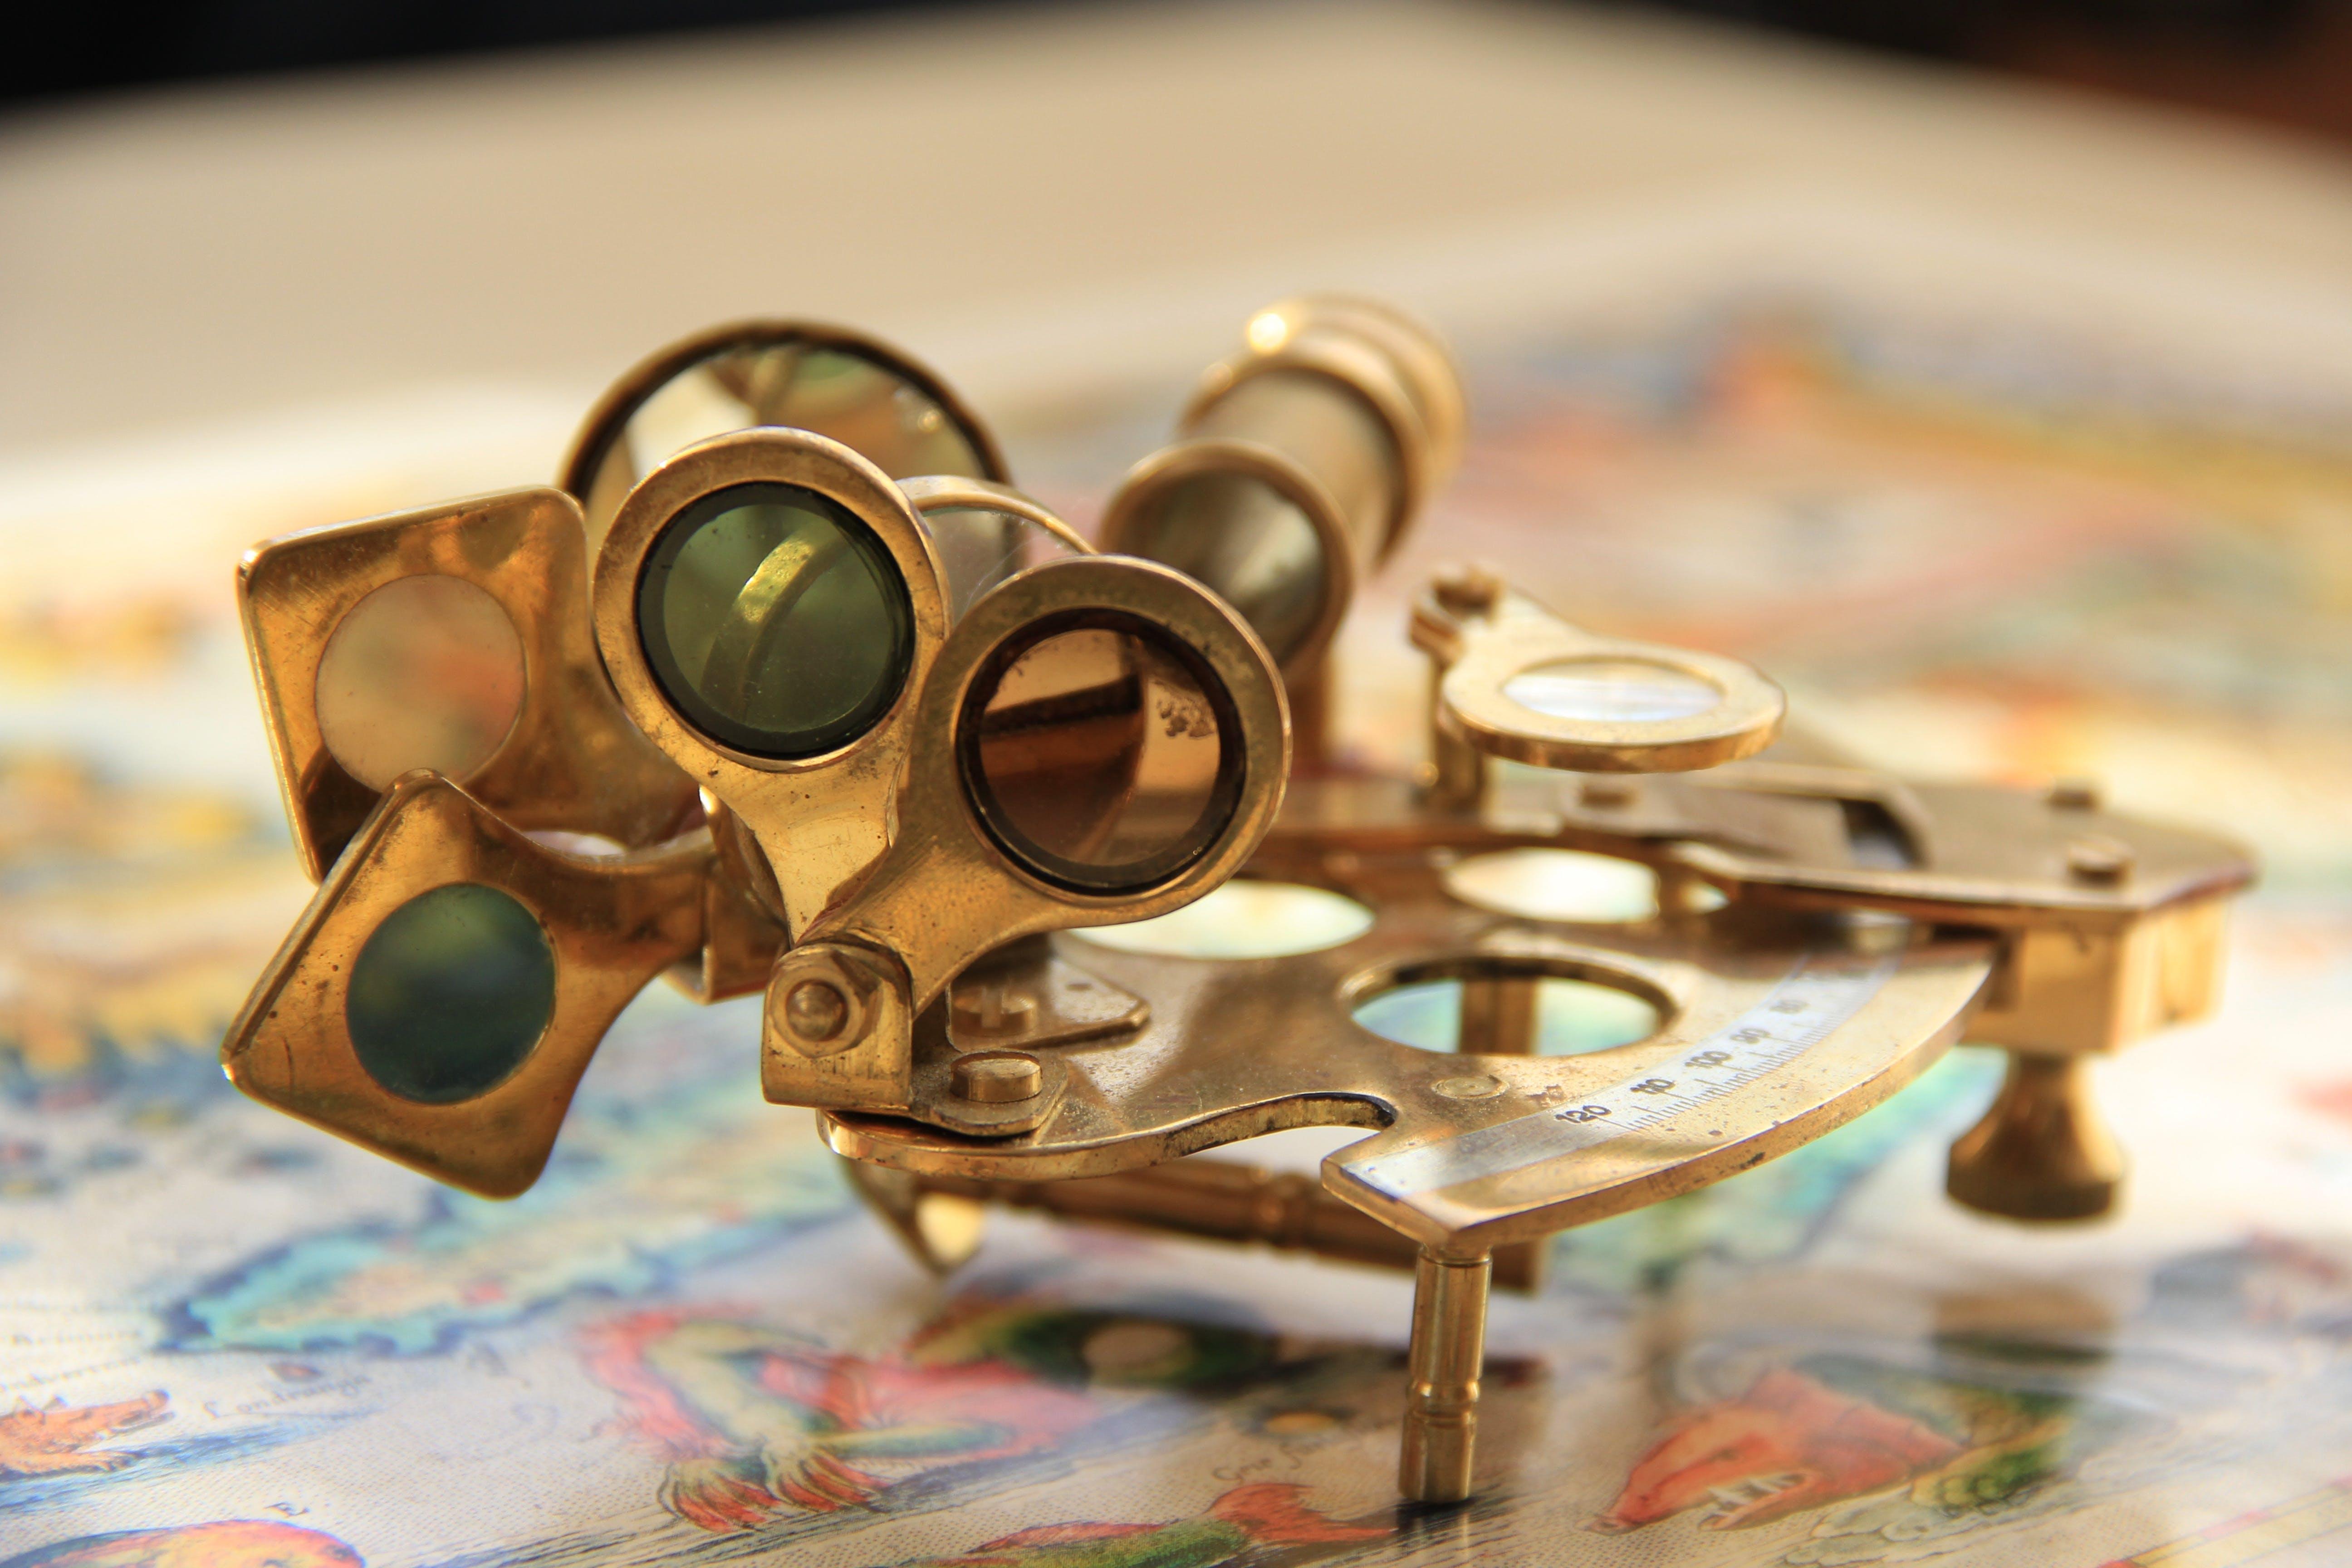 Close Up Photograph of Brass Mechanical Tool